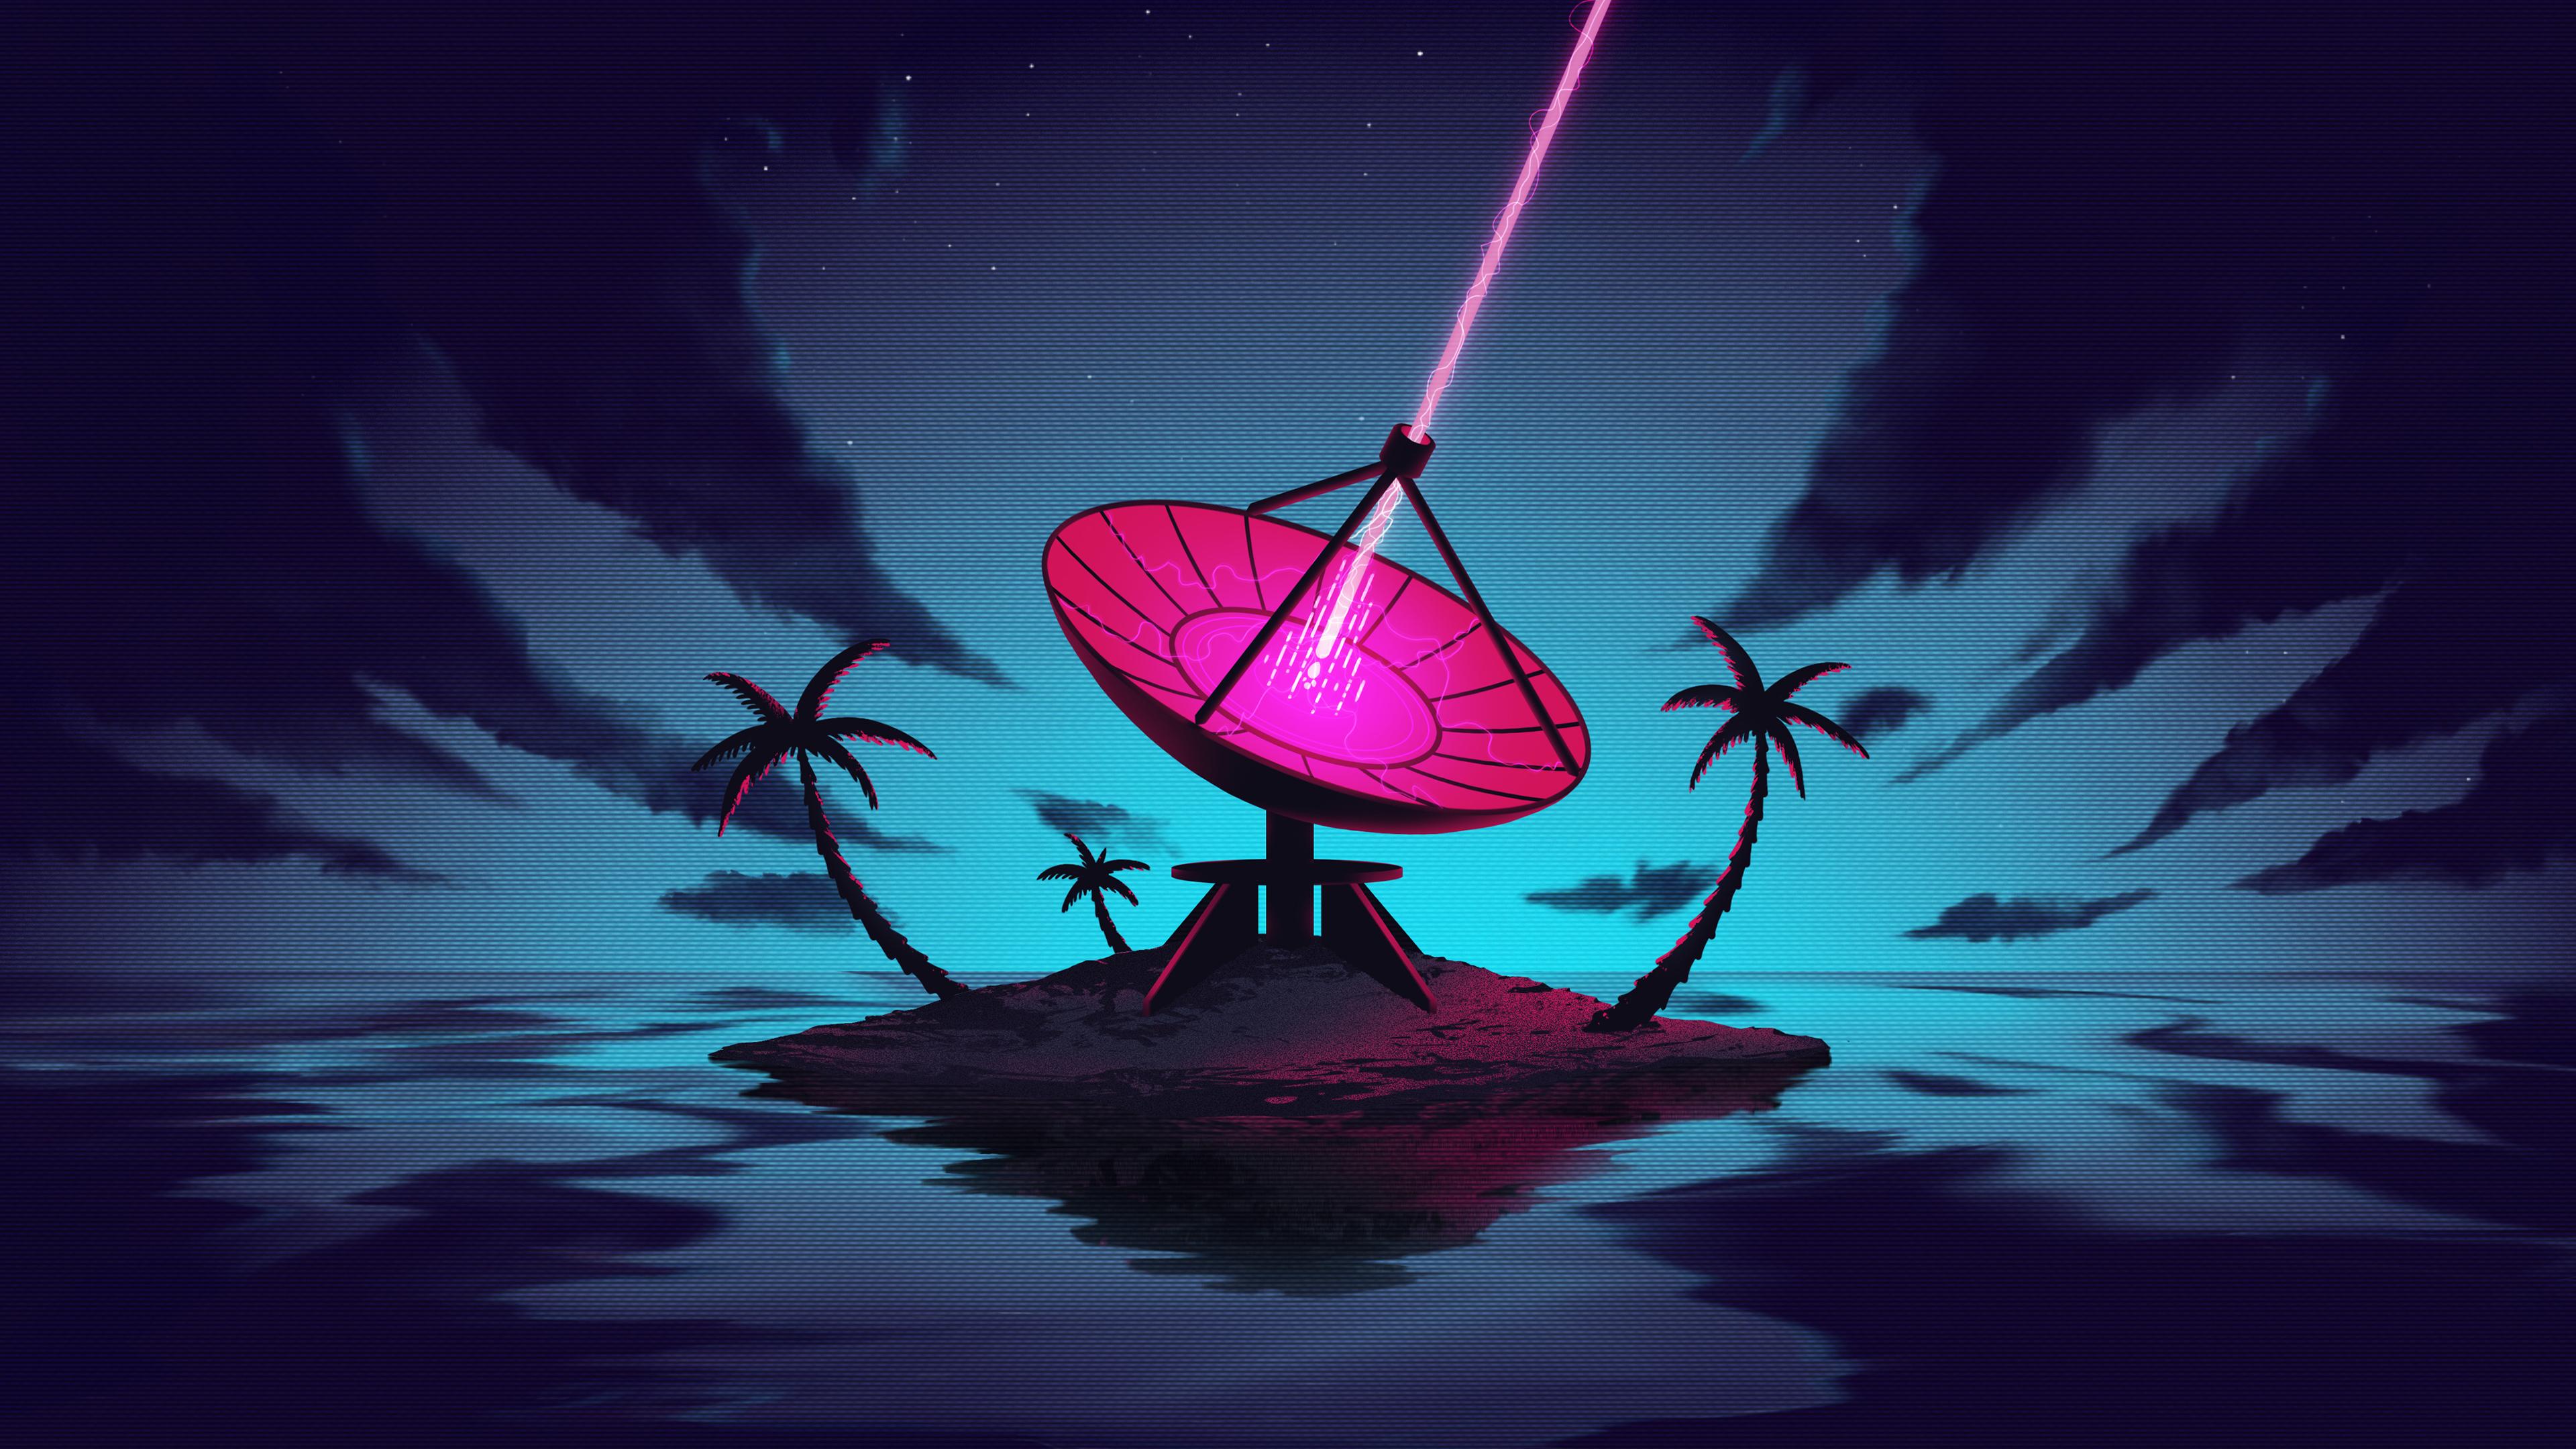 General 3840x2160 digital digital art artwork illustration trees palm trees laser antenna island 4K